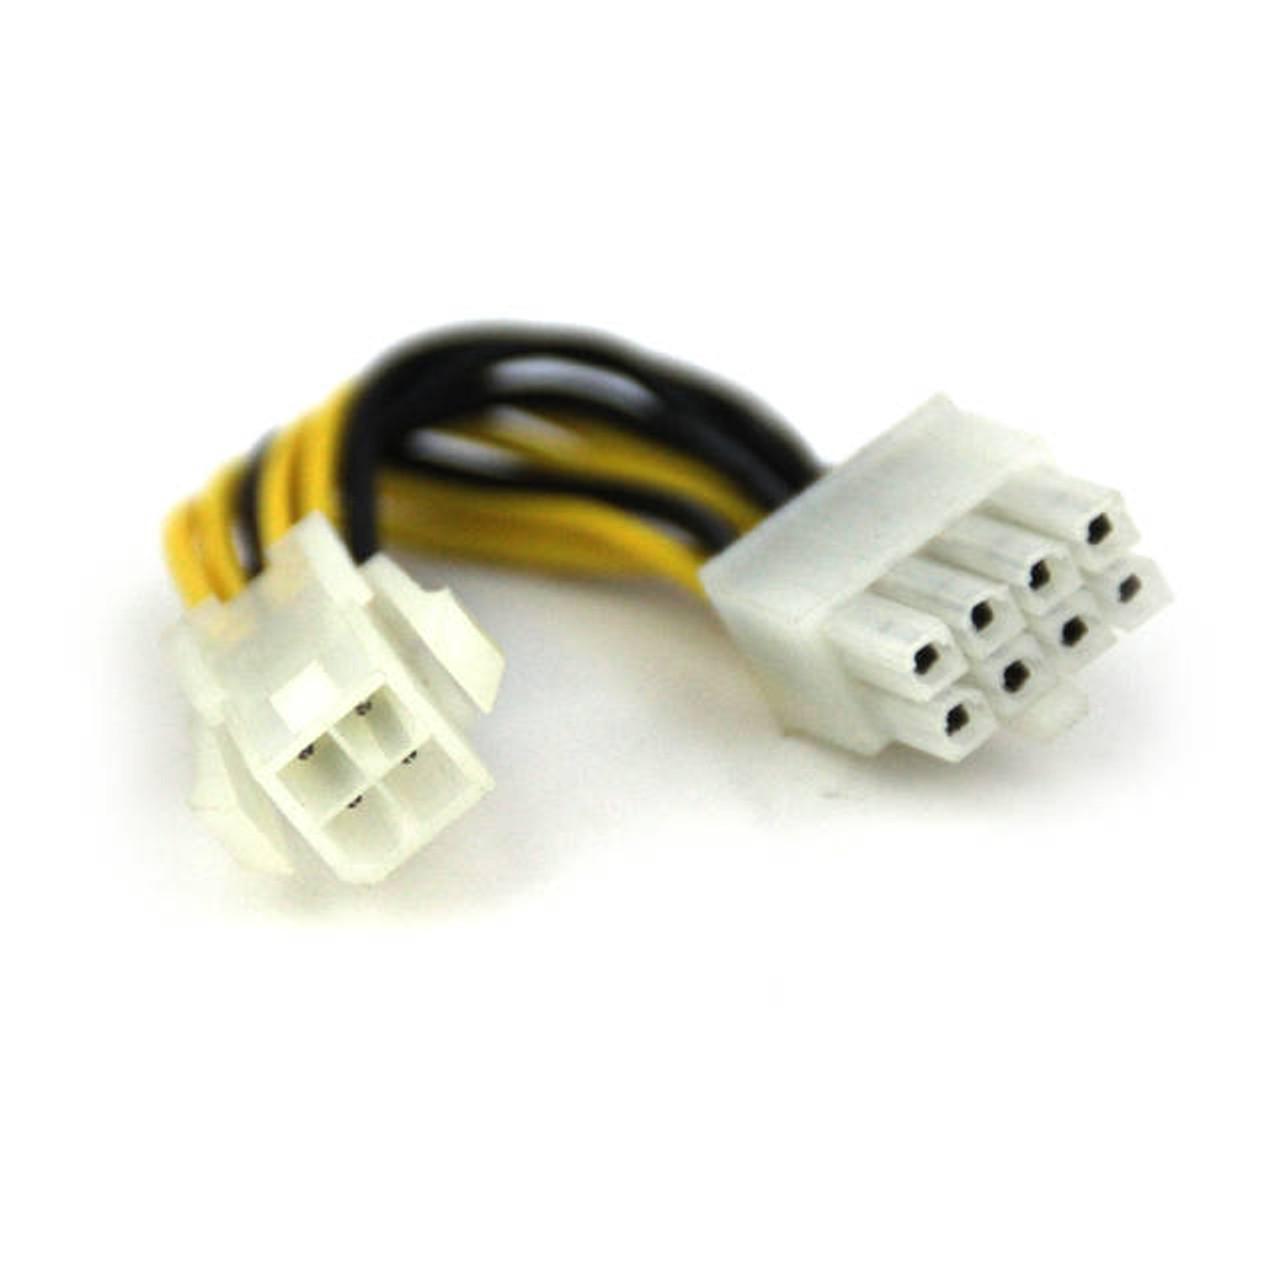 Vcom CE351 Serial ATA Power Cable 6inch